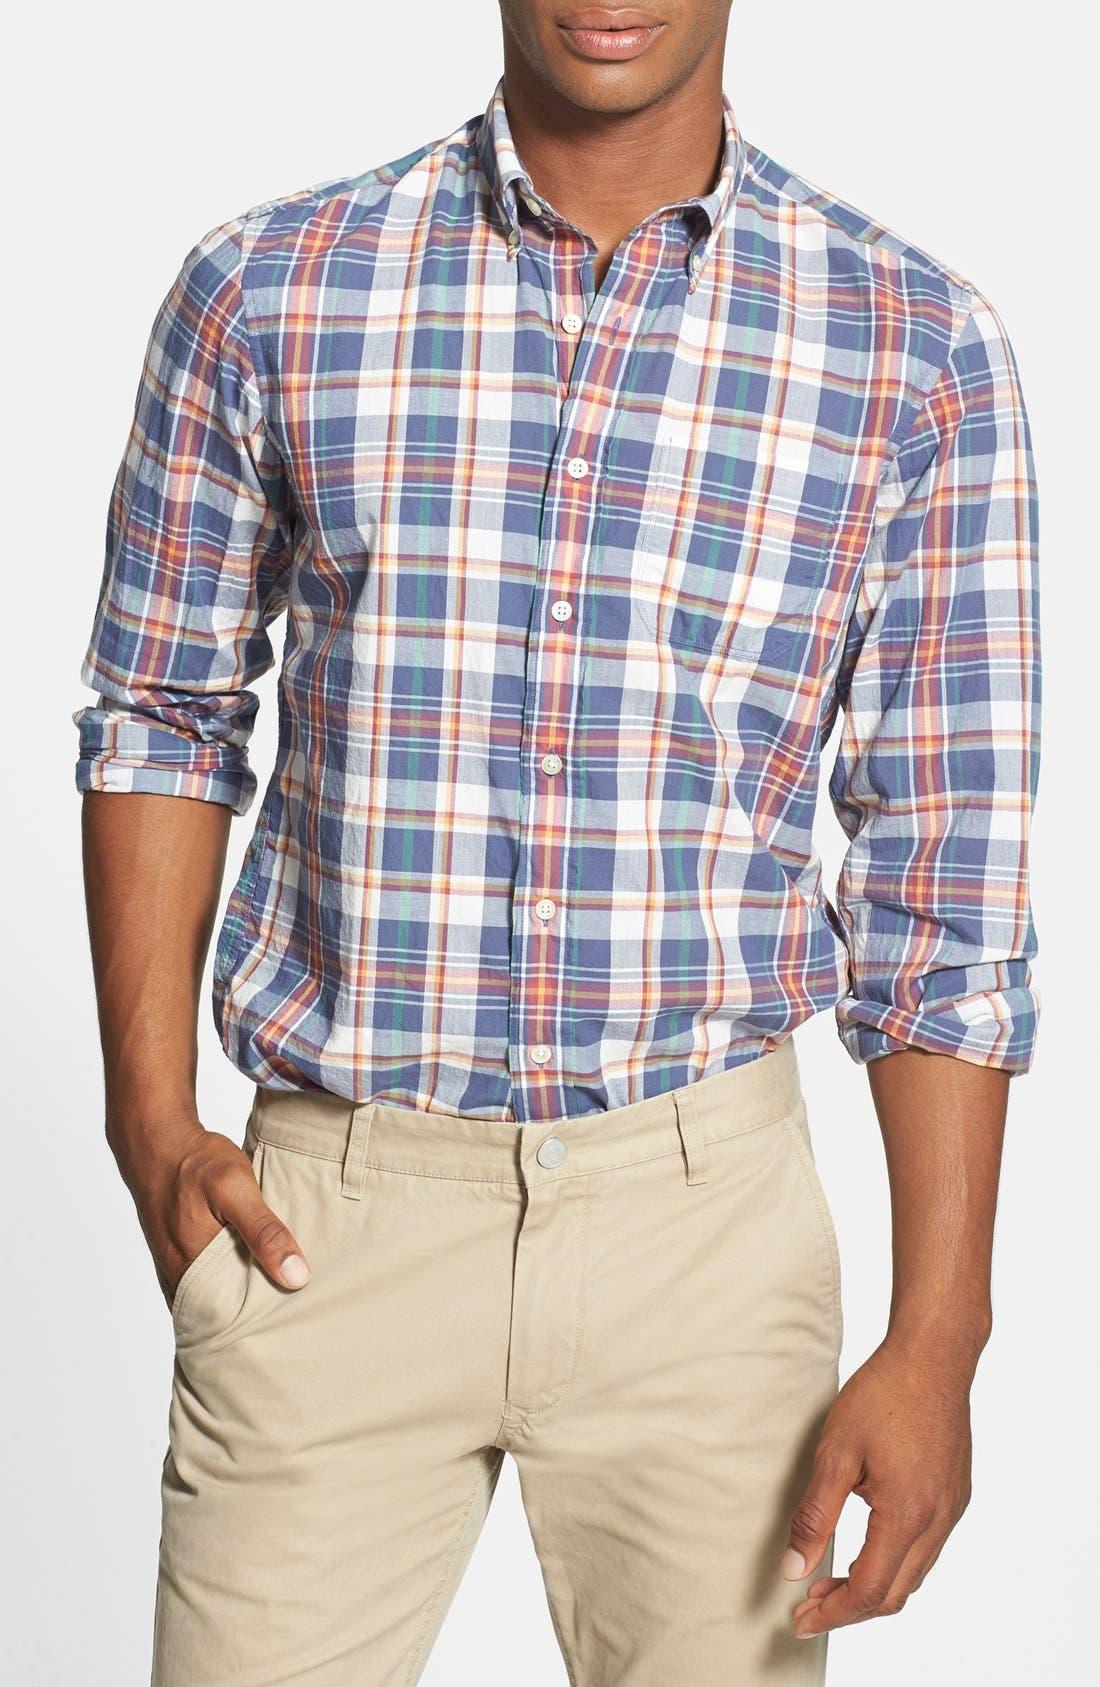 Alternate Image 1 Selected - Gant 'Handloom' Regular Fit Madras Sport Shirt